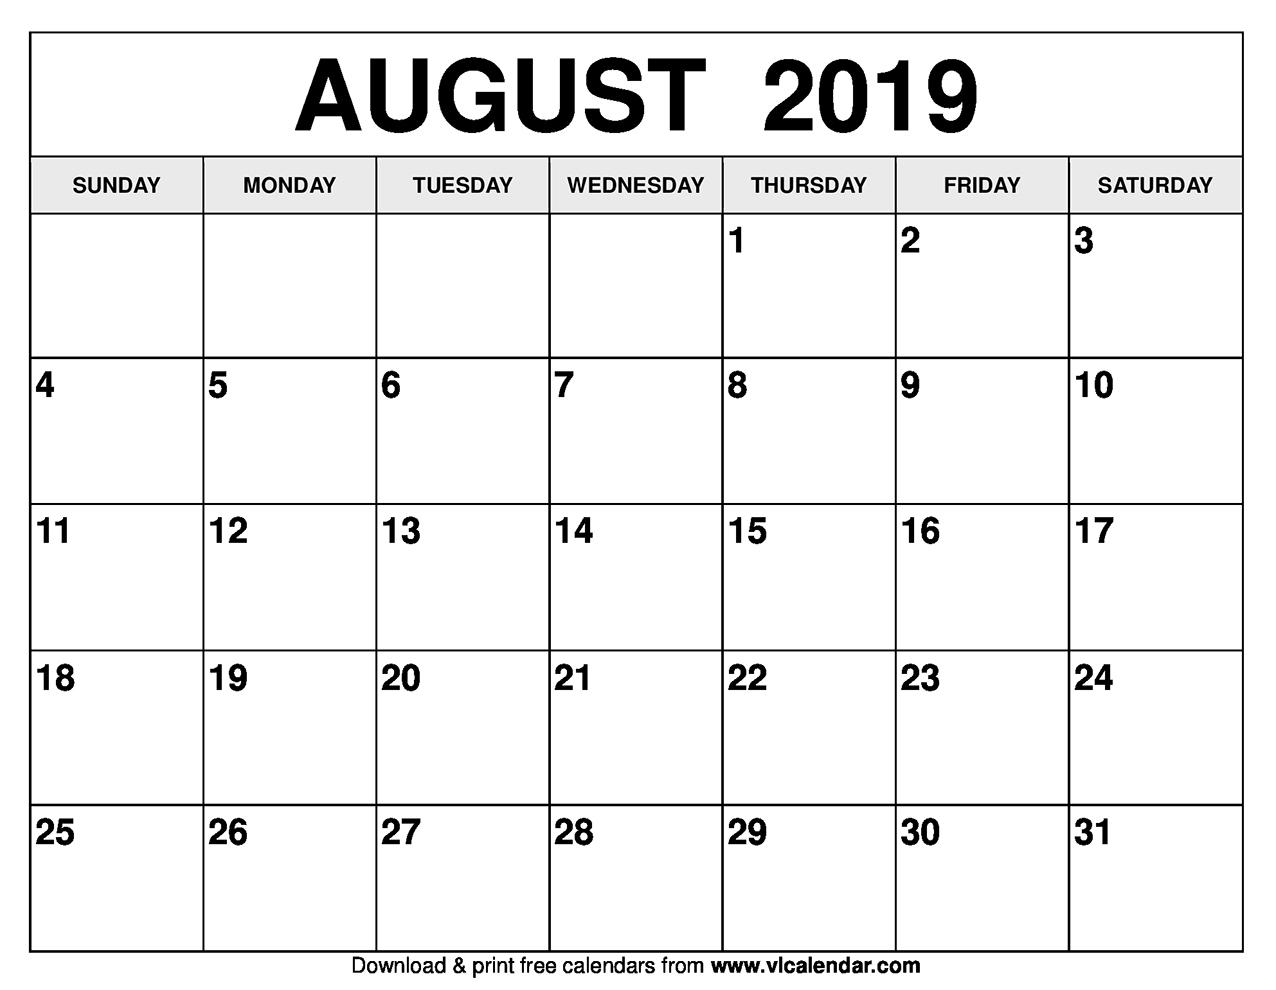 August 2019 Calendar Printable Templates